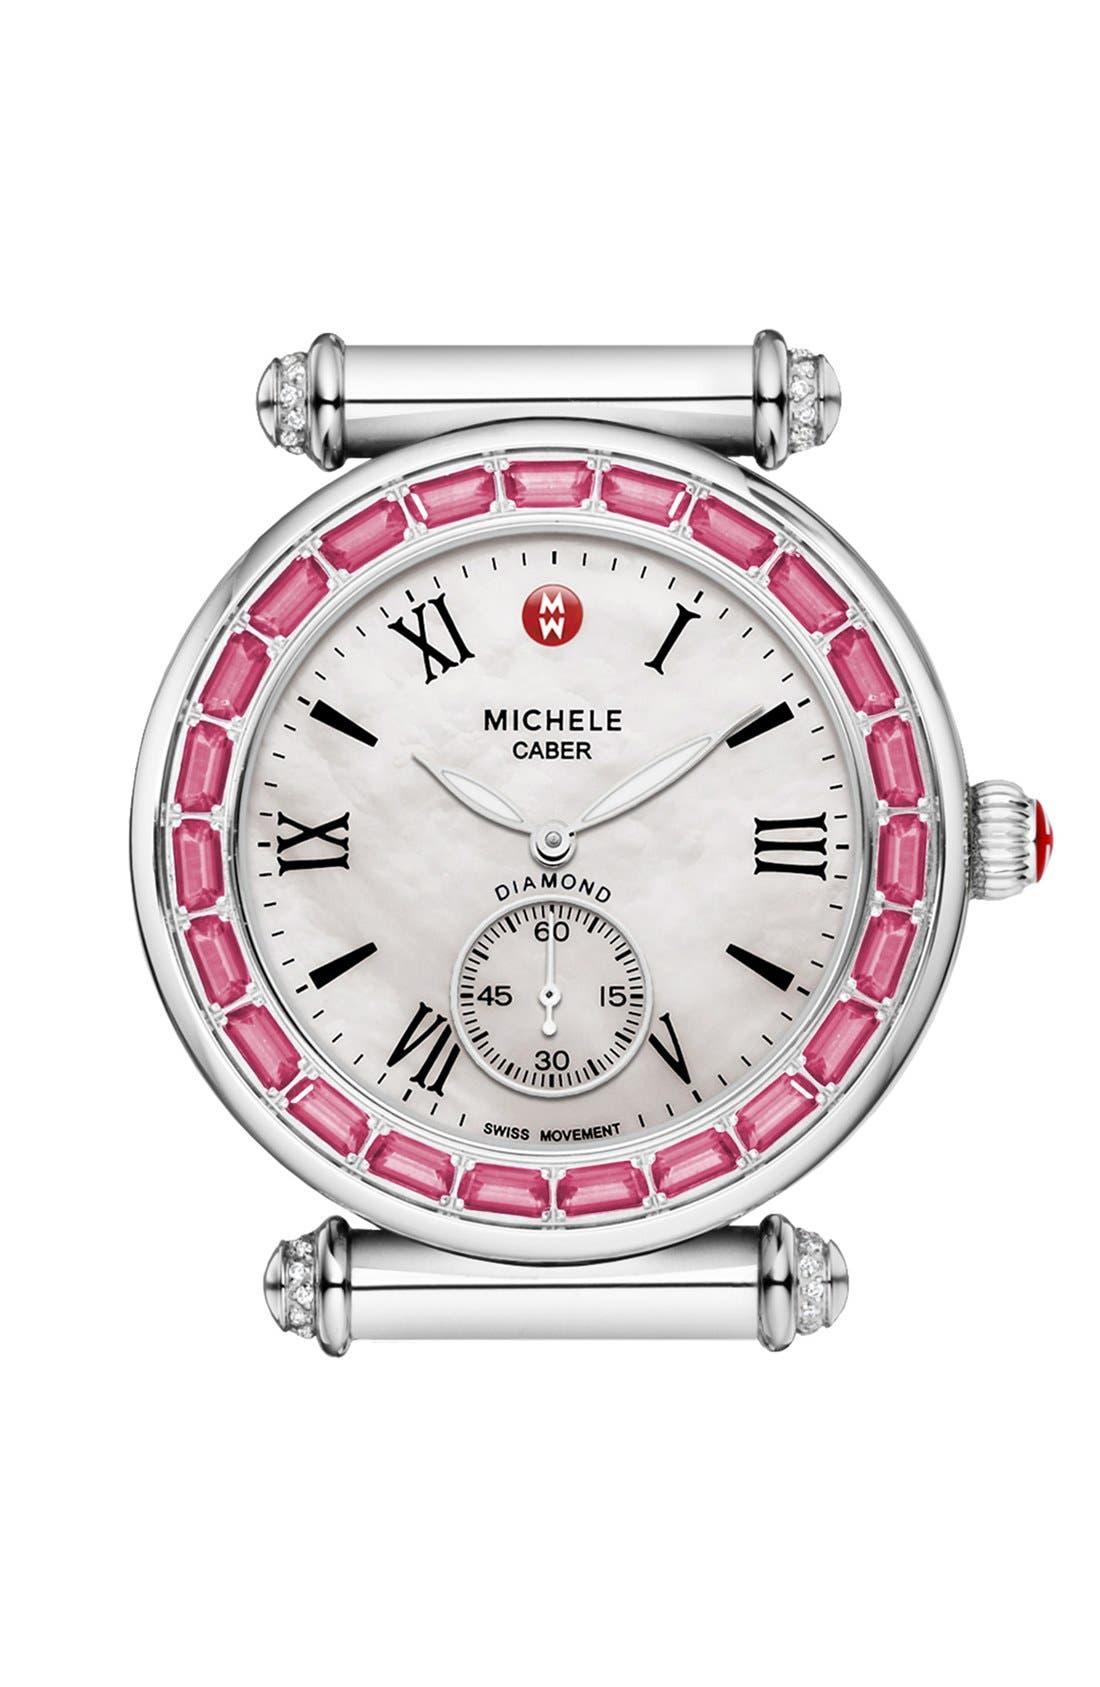 Alternate Image 1 Selected - MICHELE 'Caber' Diamond Watch Case, 37mm